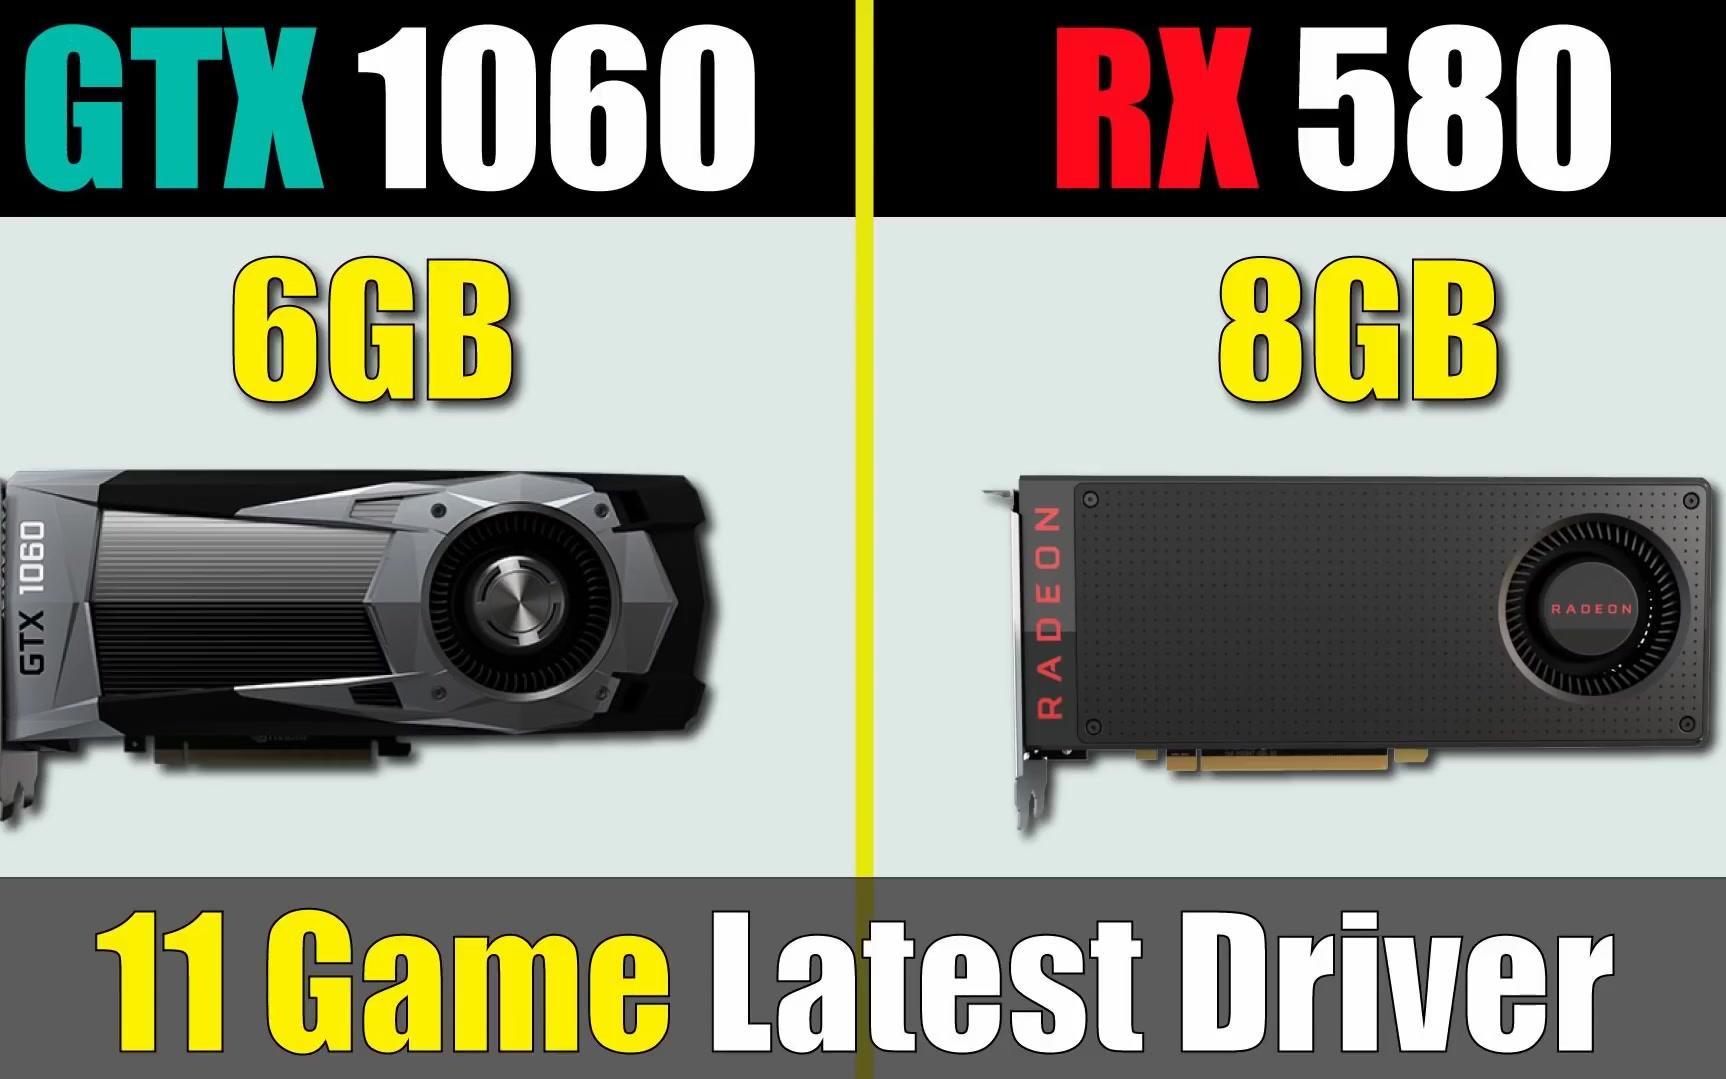 GTX 1060 vs RX 580 最新驱动程序基准测试_哔哩哔哩 (゜-゜)つロ 干杯~-bilibili